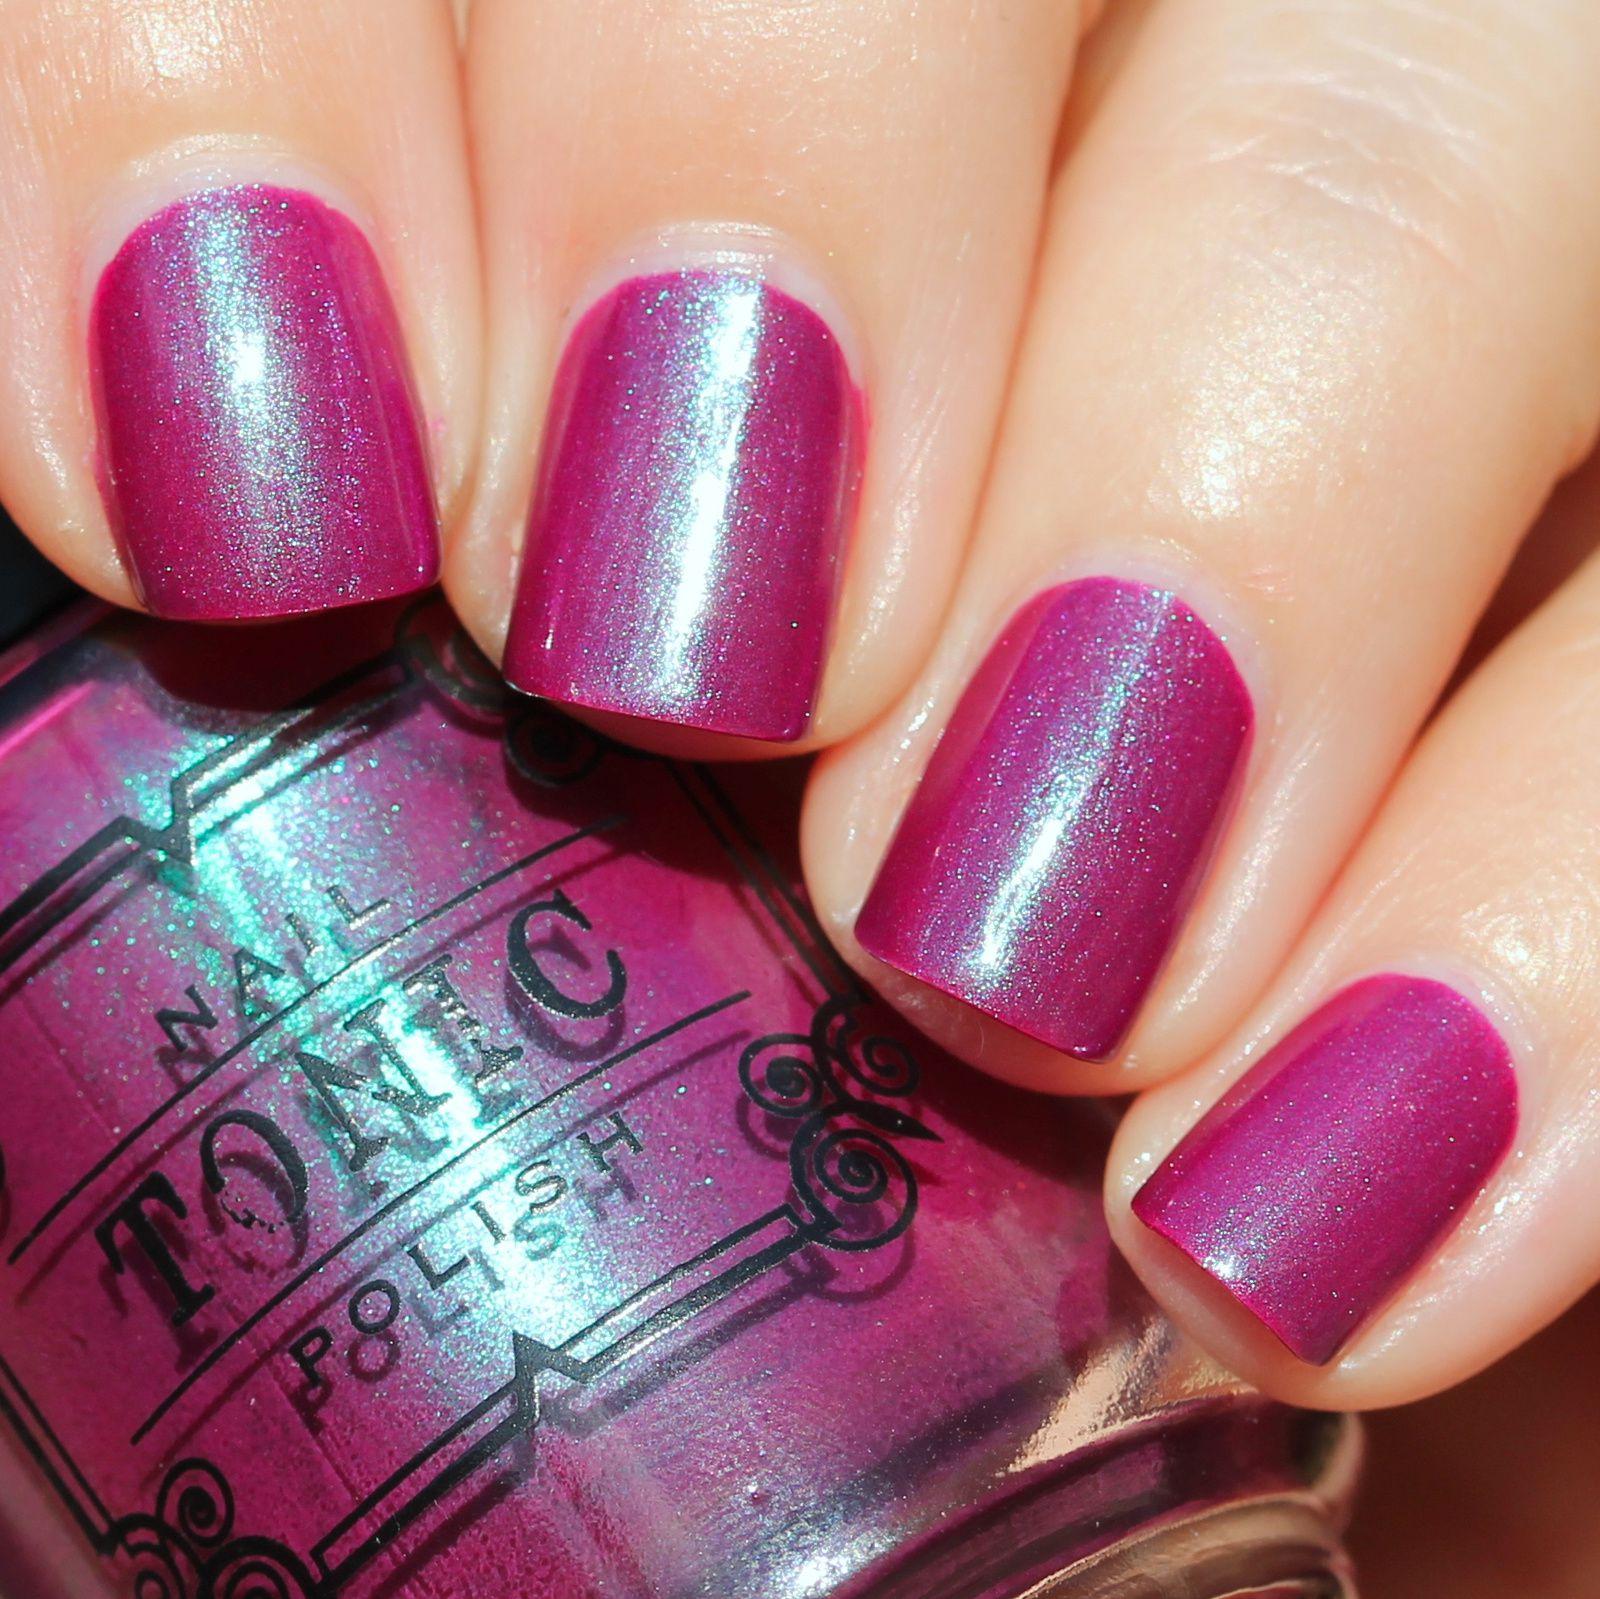 Essie Protein Base Coat / Tonic Polish Berried Un-Teal Spring / HK Girl Top Coat